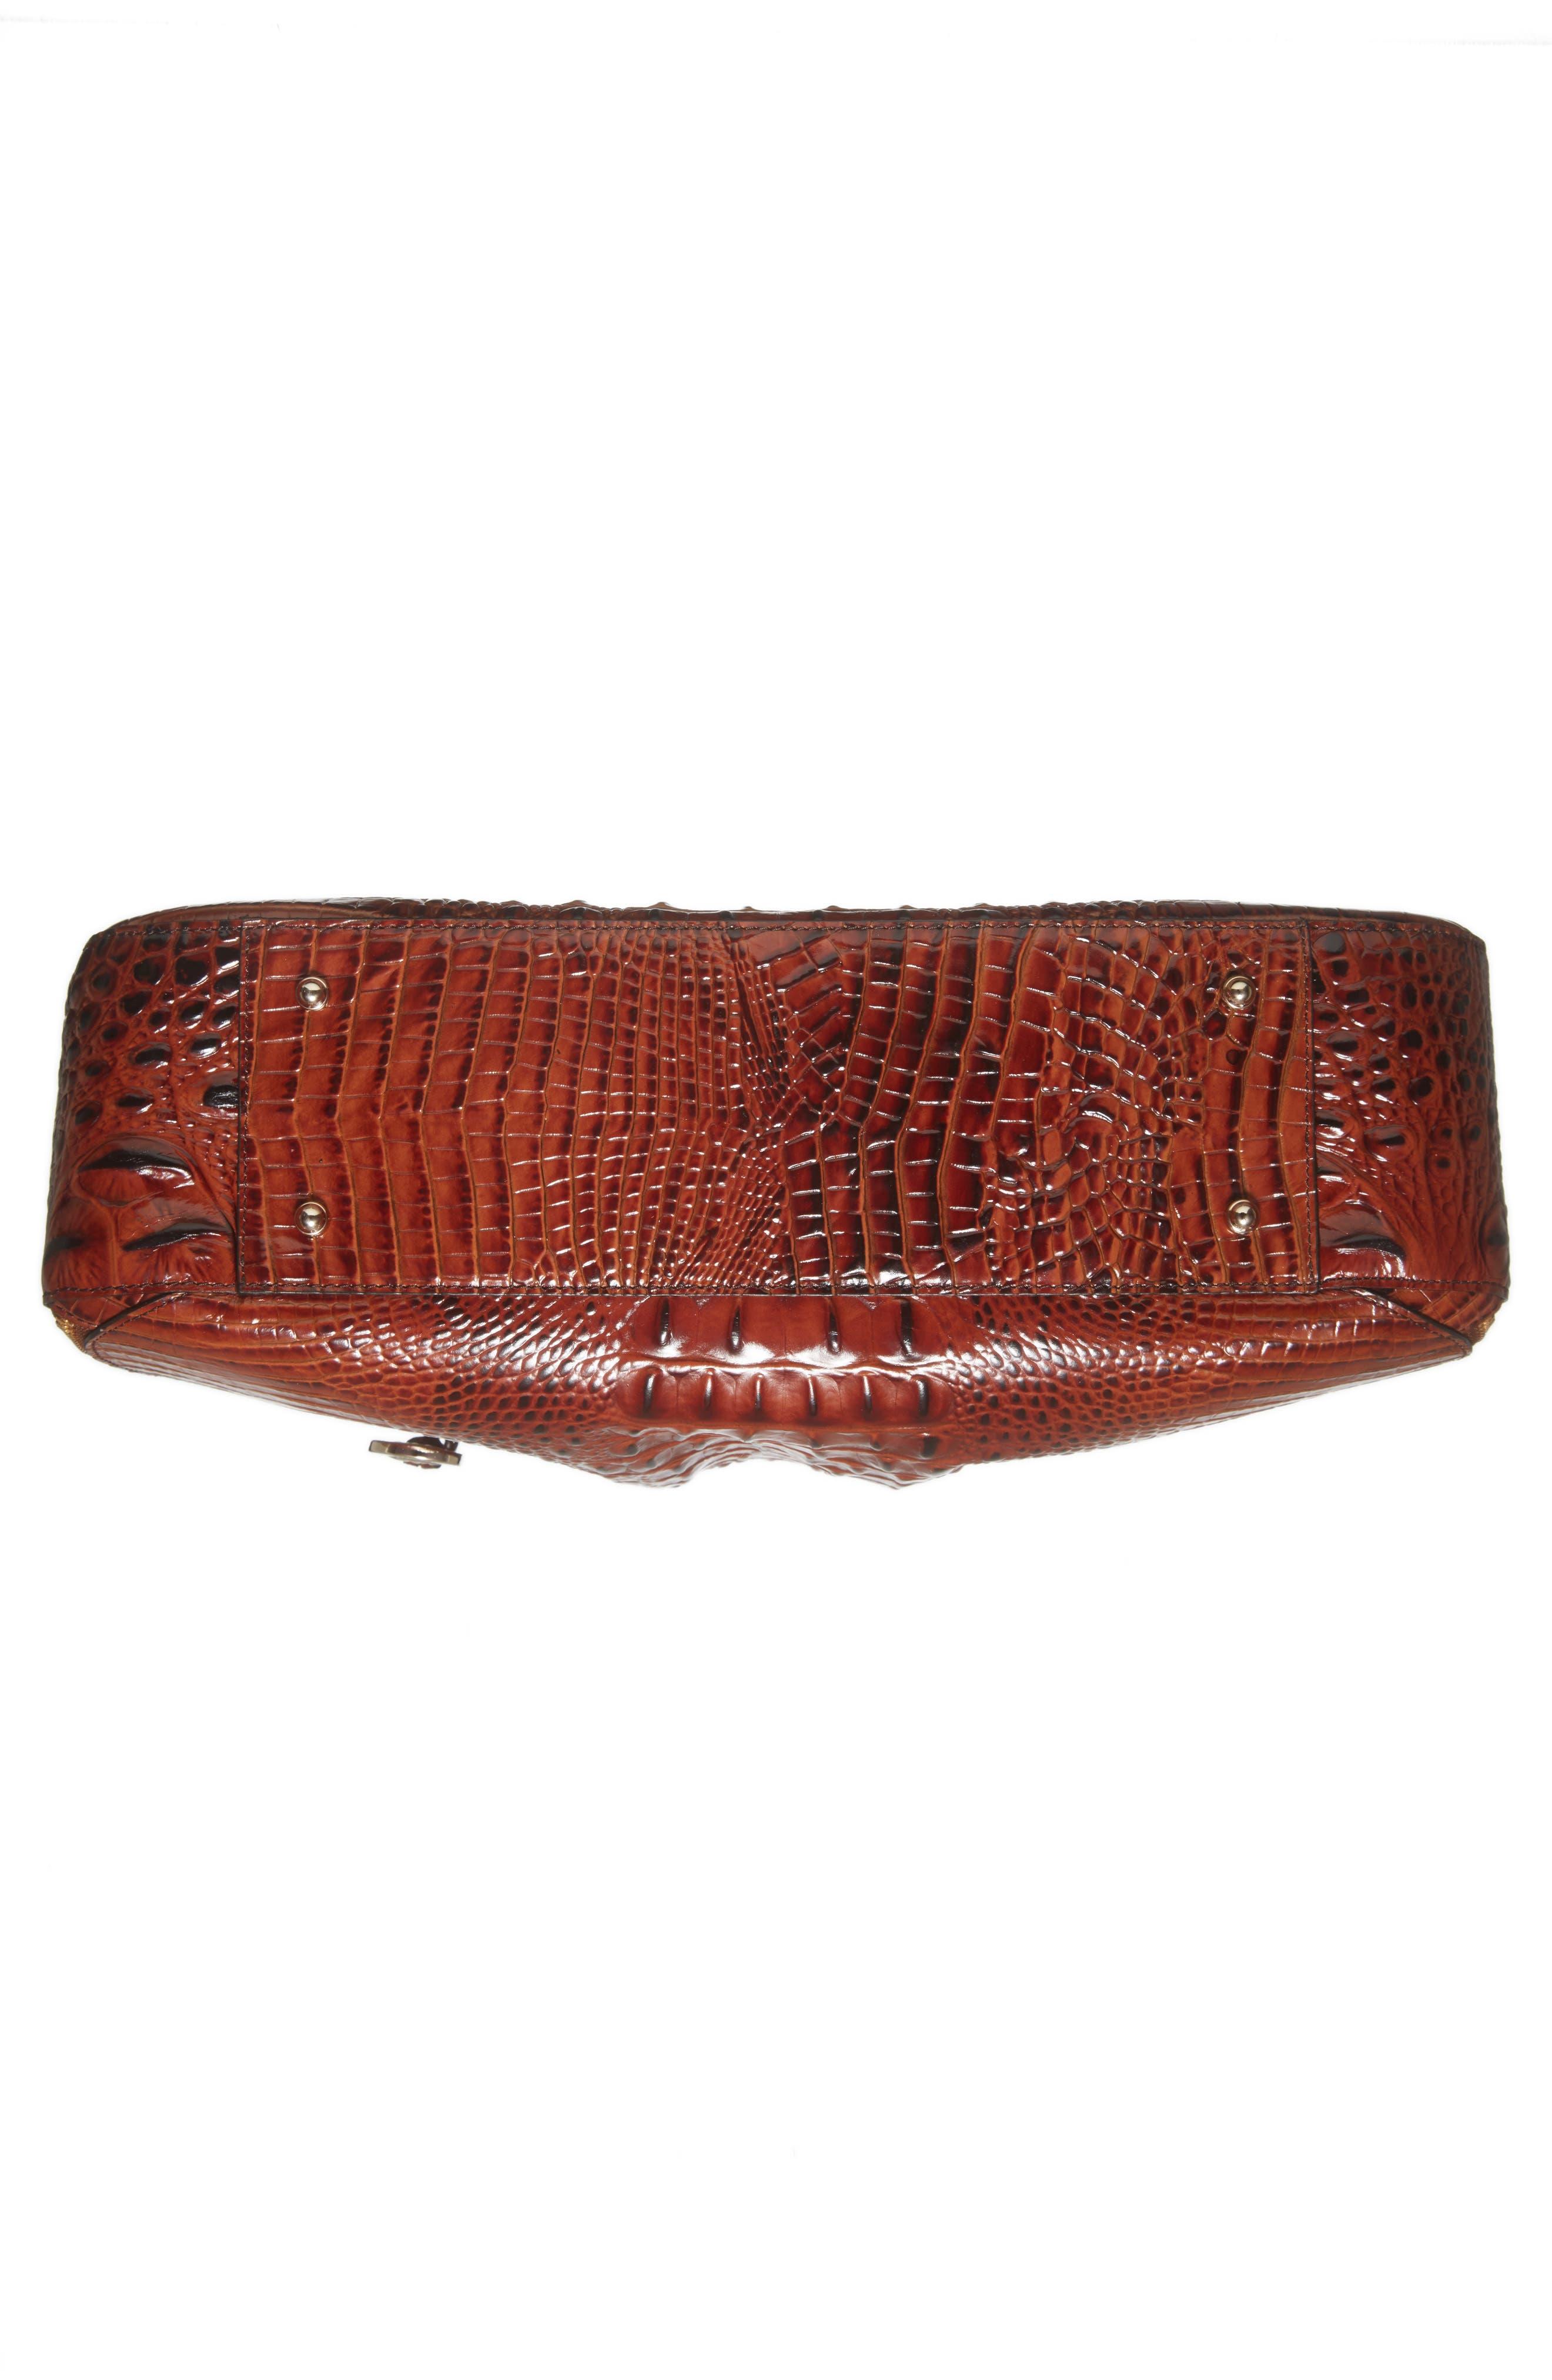 Melbourne - Adina Croc Embossed Leather Satchel,                             Alternate thumbnail 6, color,                             Pecan